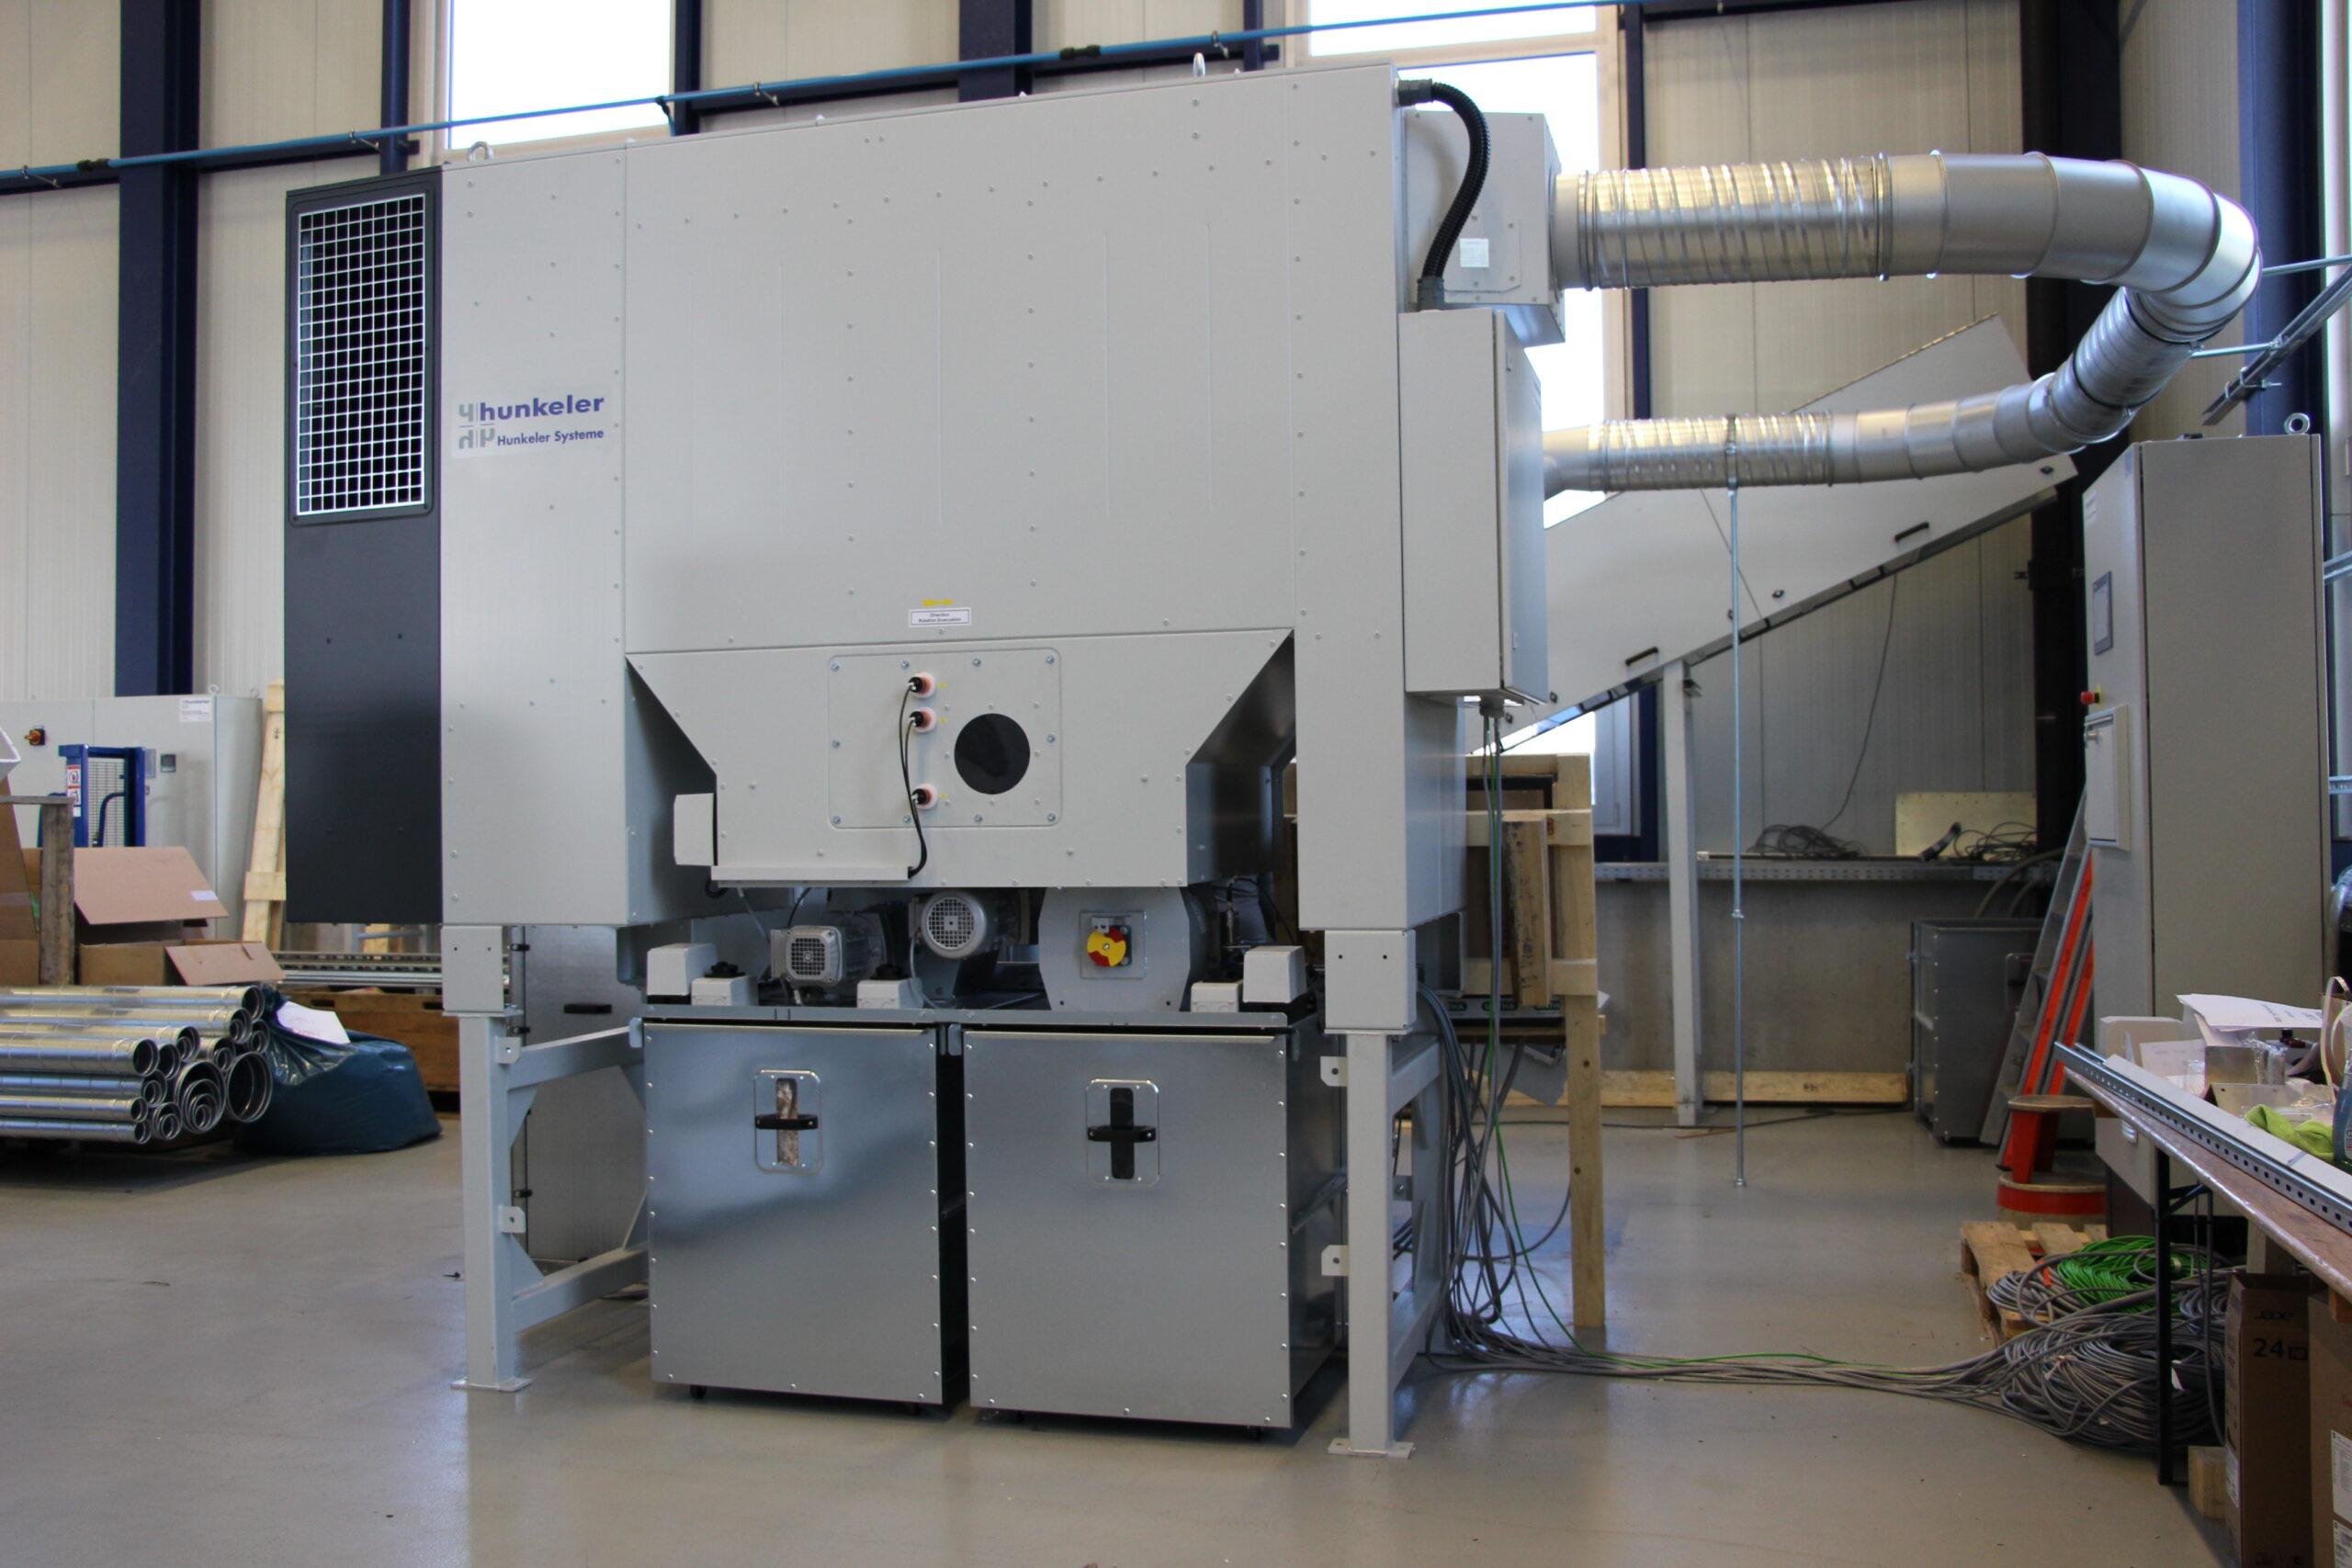 HKU 4510 B-C / 1500 B-C